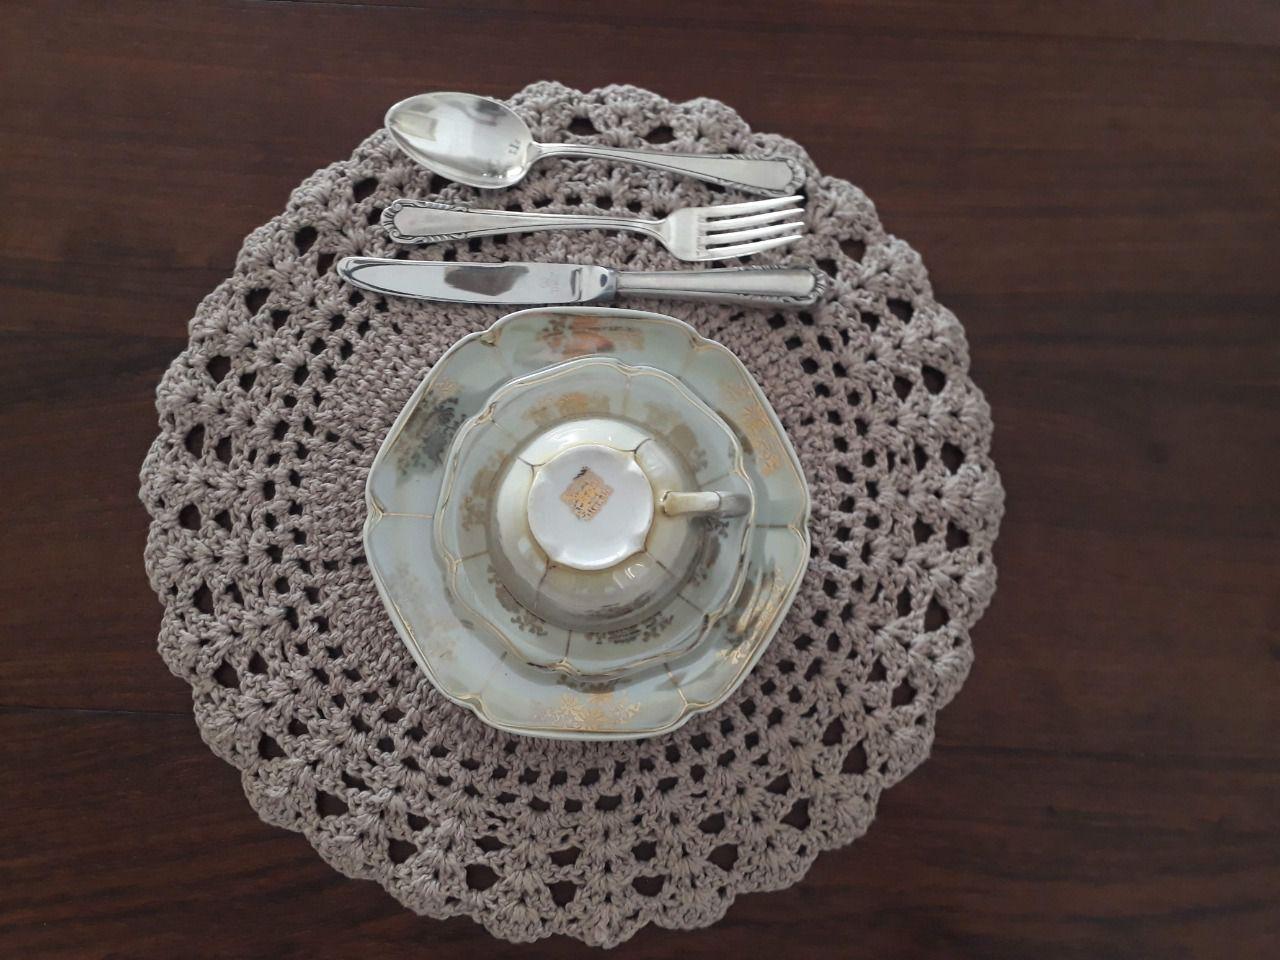 Sousplat de Crochet Bege Kit com 8  - Helô Reis Store